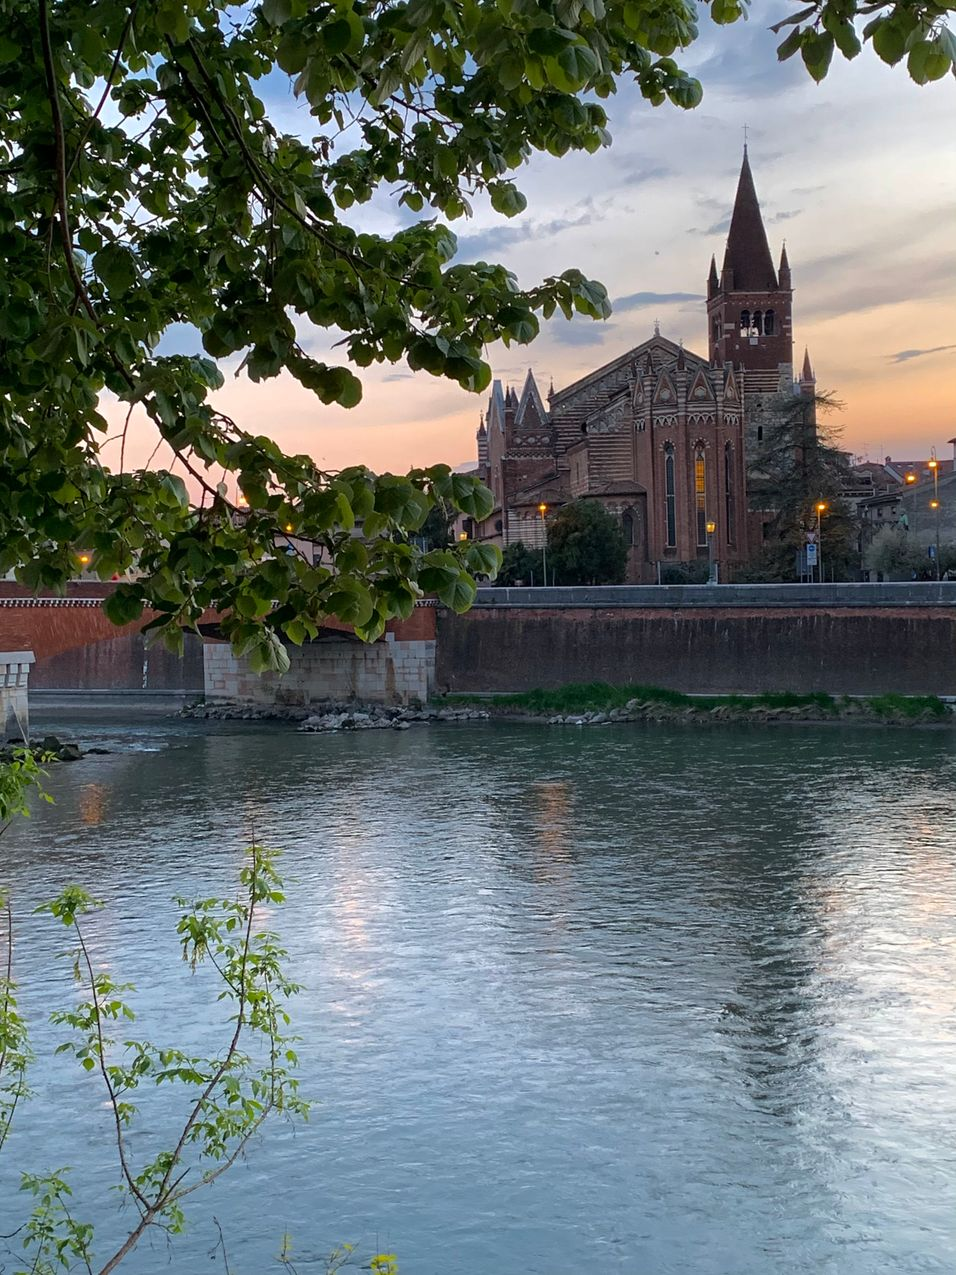 Church of San Fermo - Verona, Italy